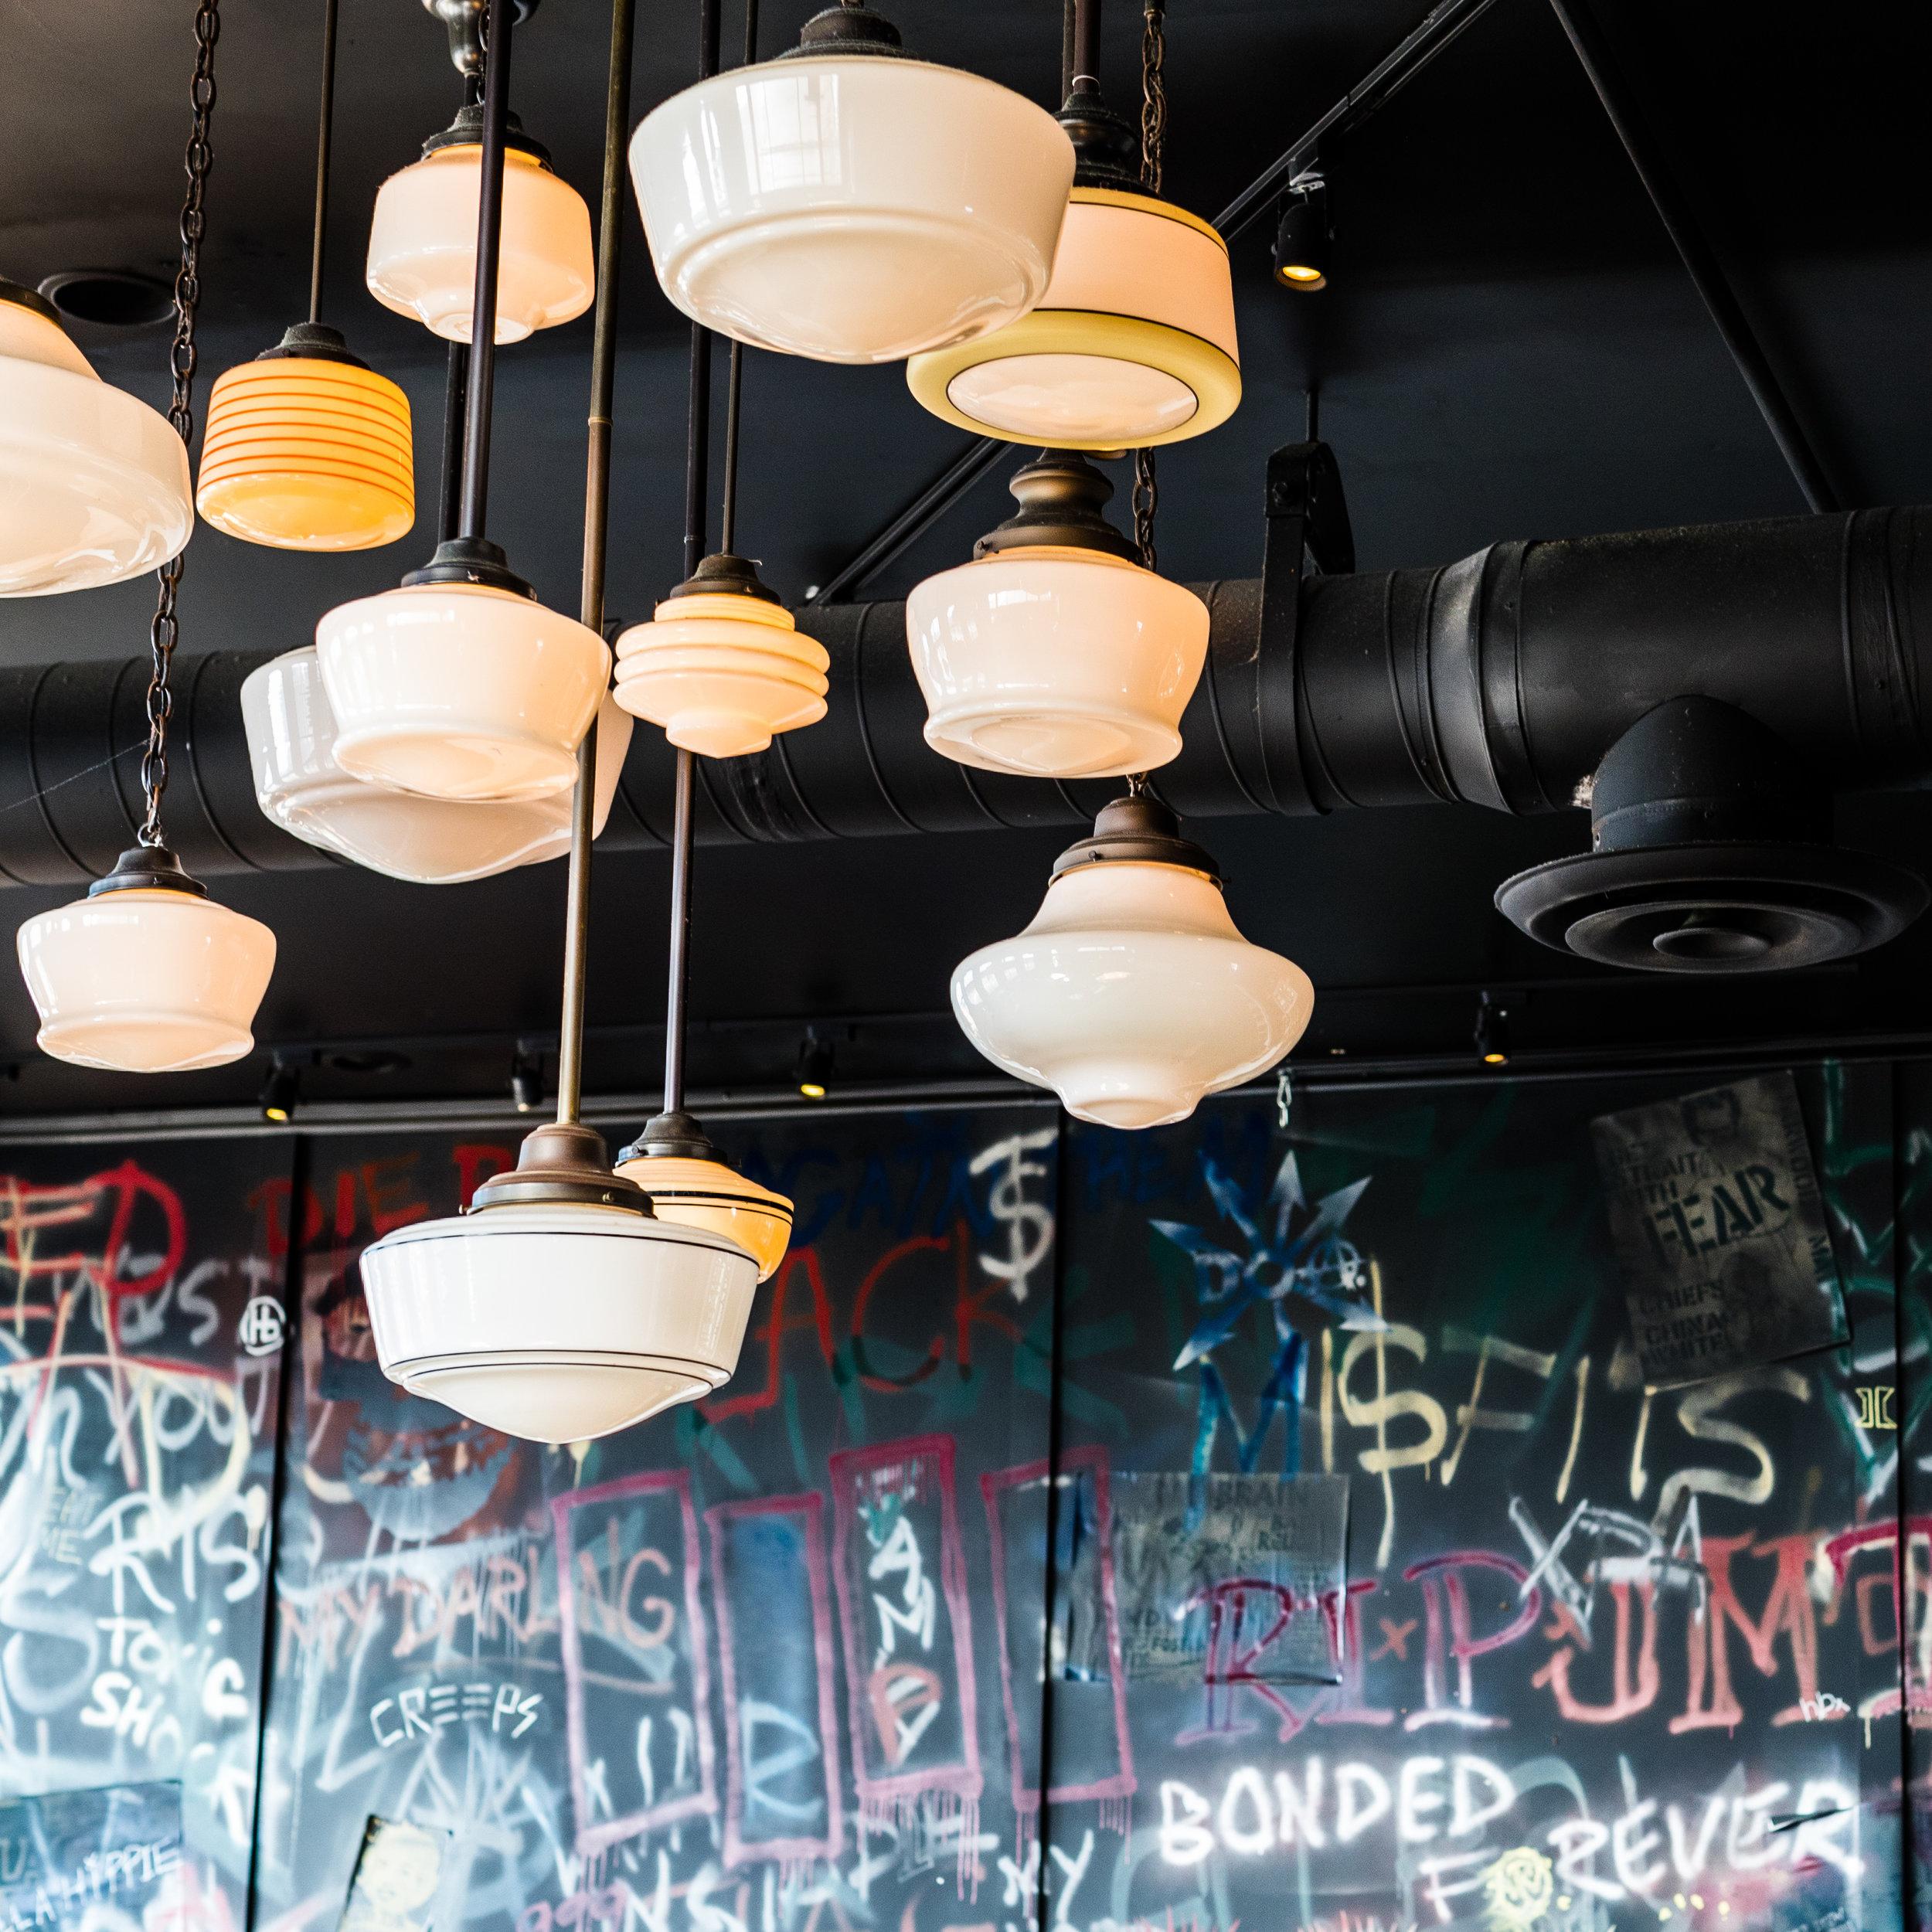 Hanging Lights at Abigaile